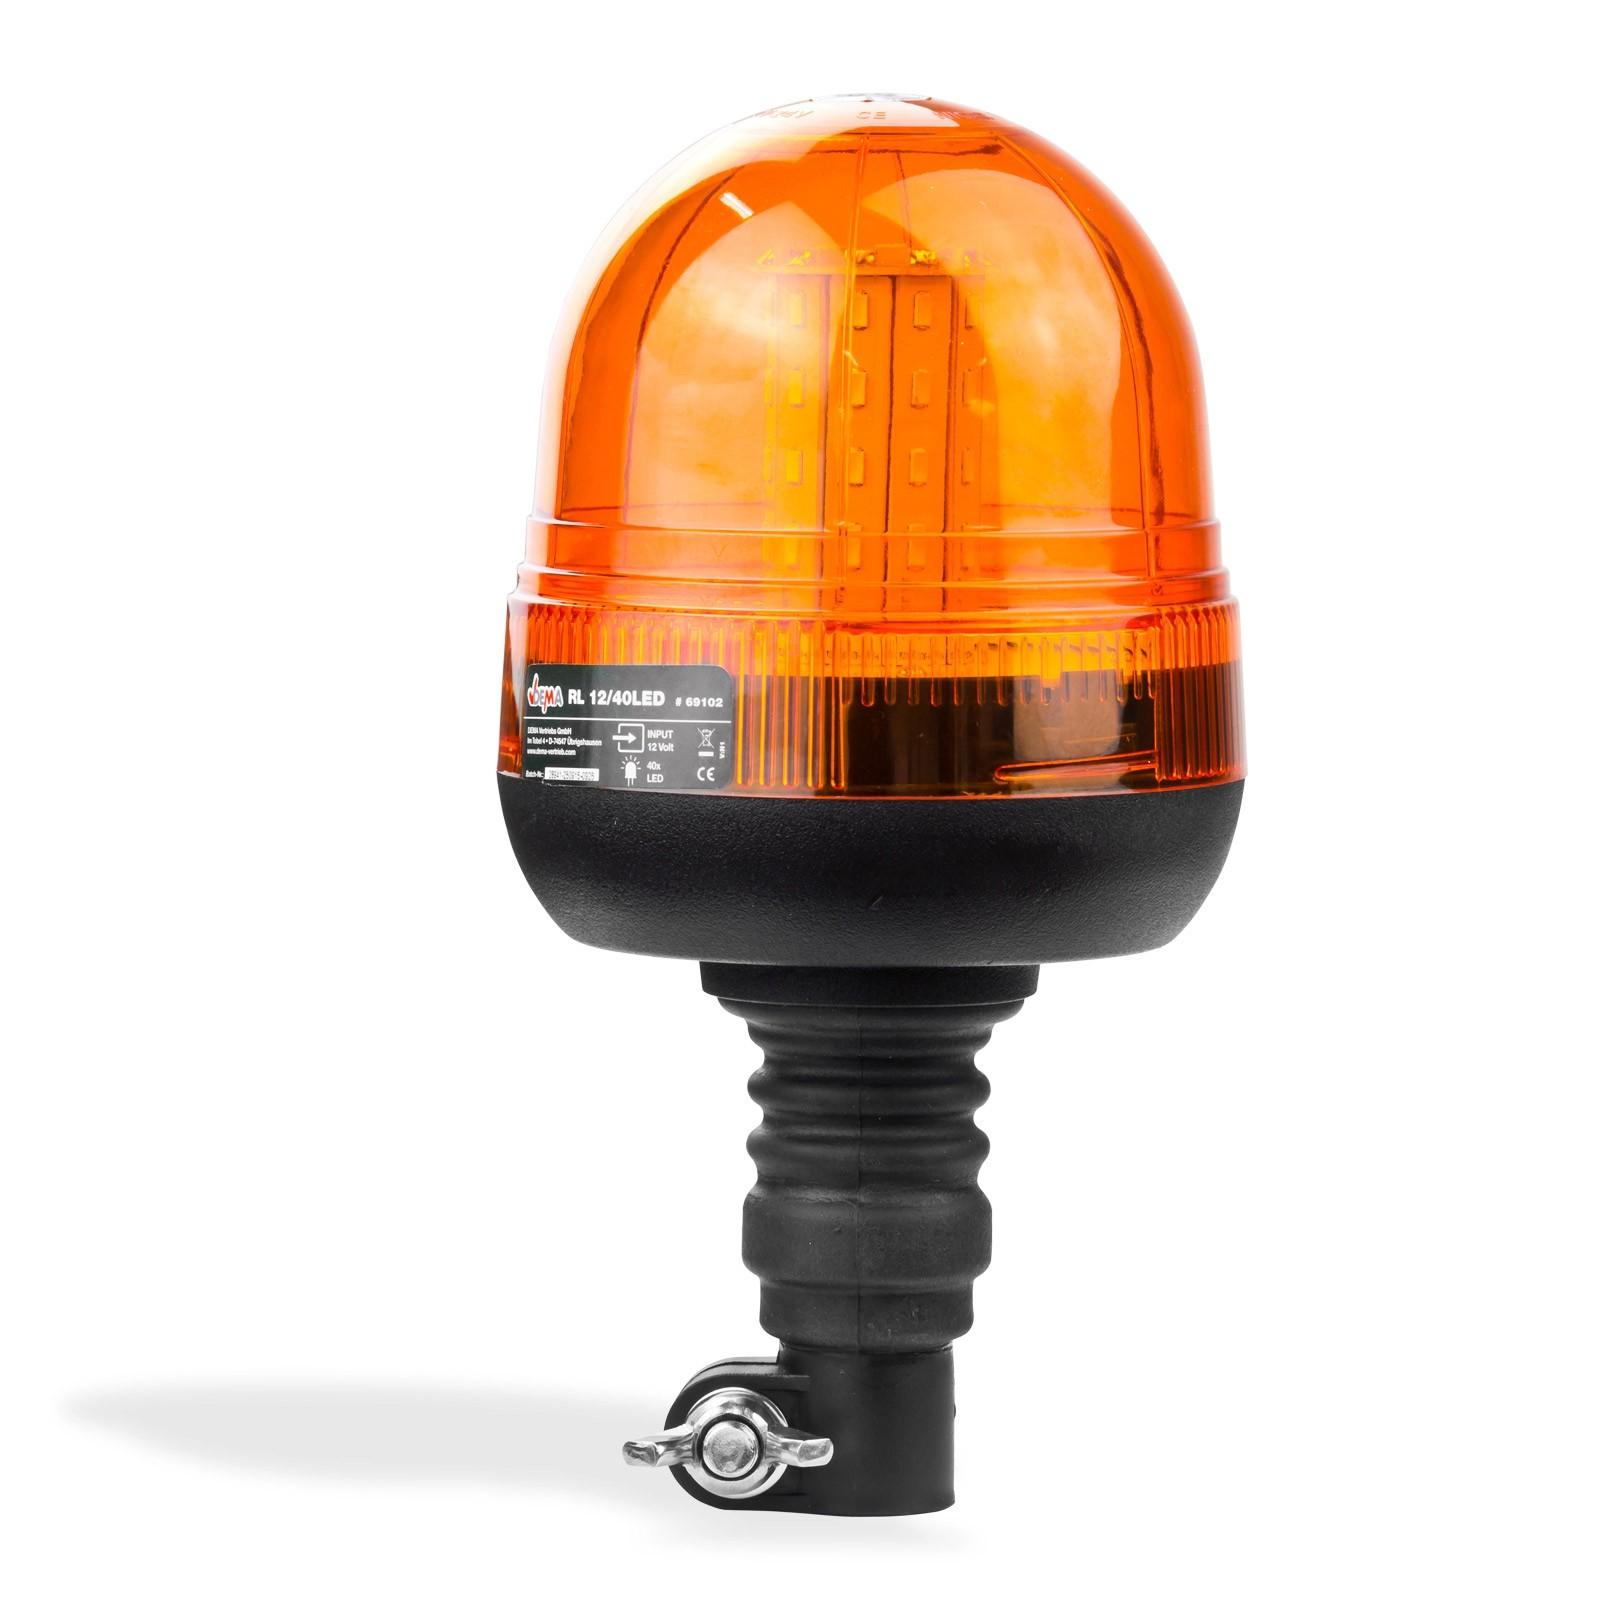 Dema Rundumleuchte / Rundumlicht LED40 12 Volt 40 Leds Ultrahell 69102